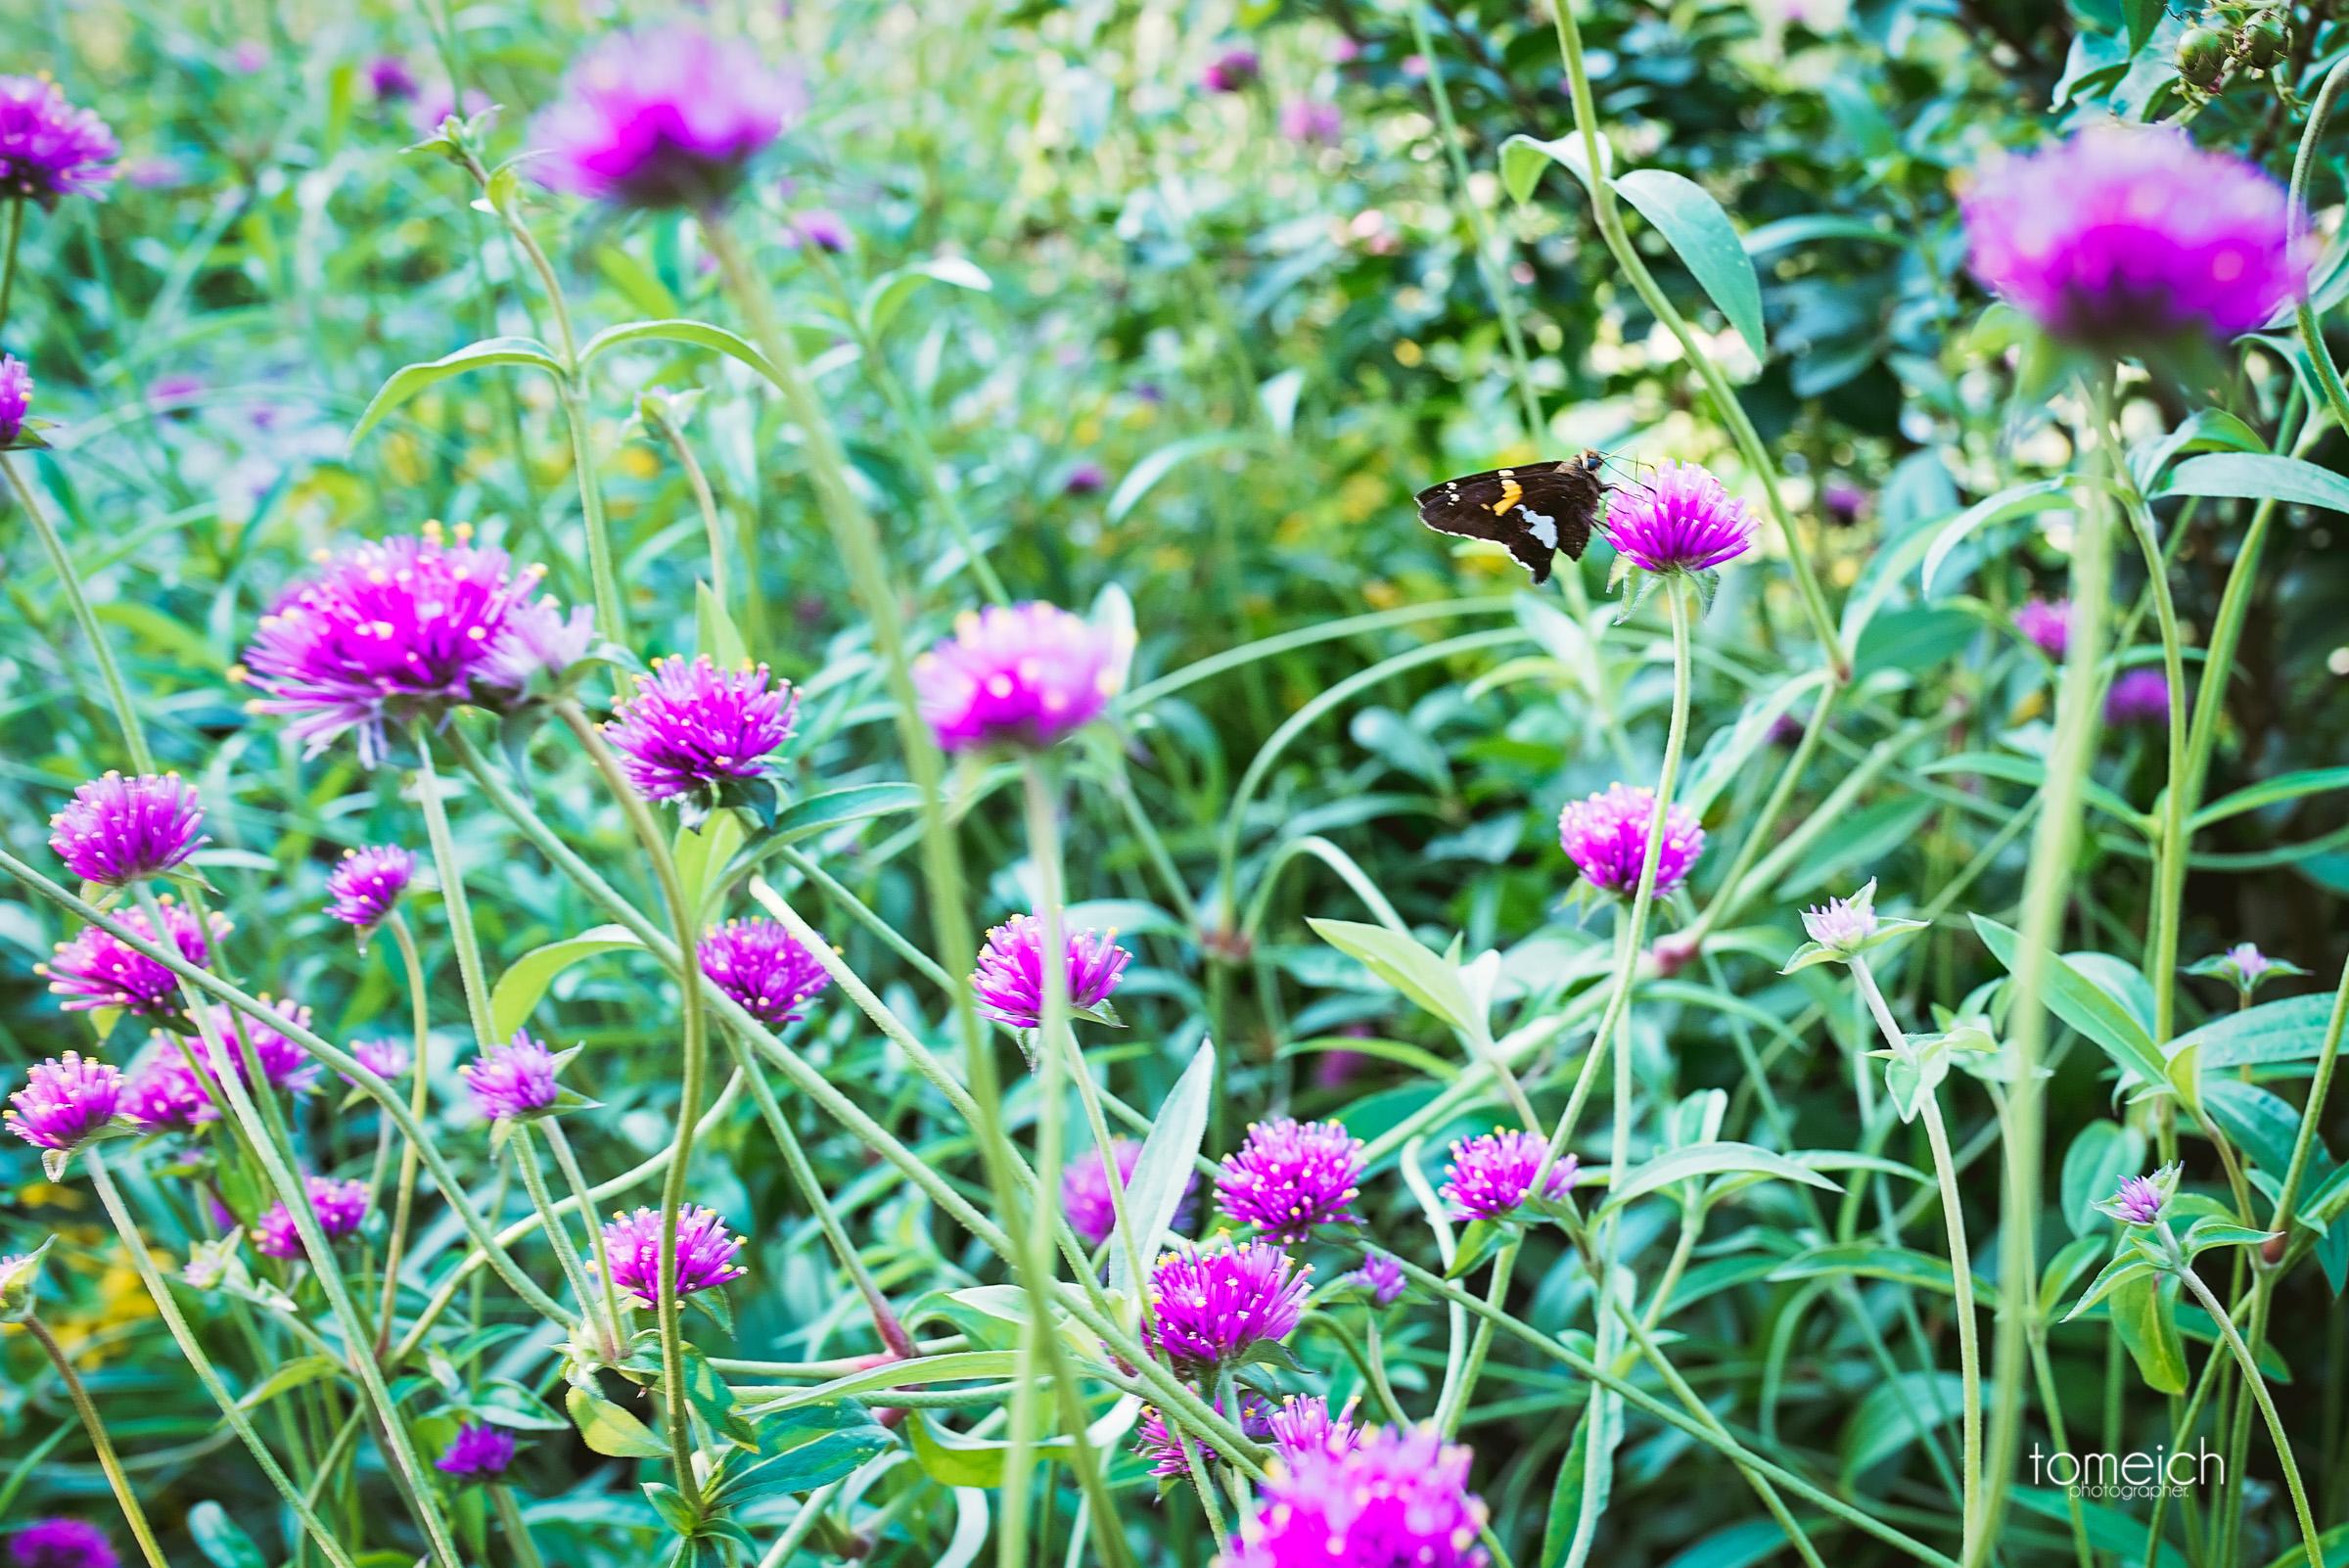 butterfly house wedding chesterfield-25.jpg